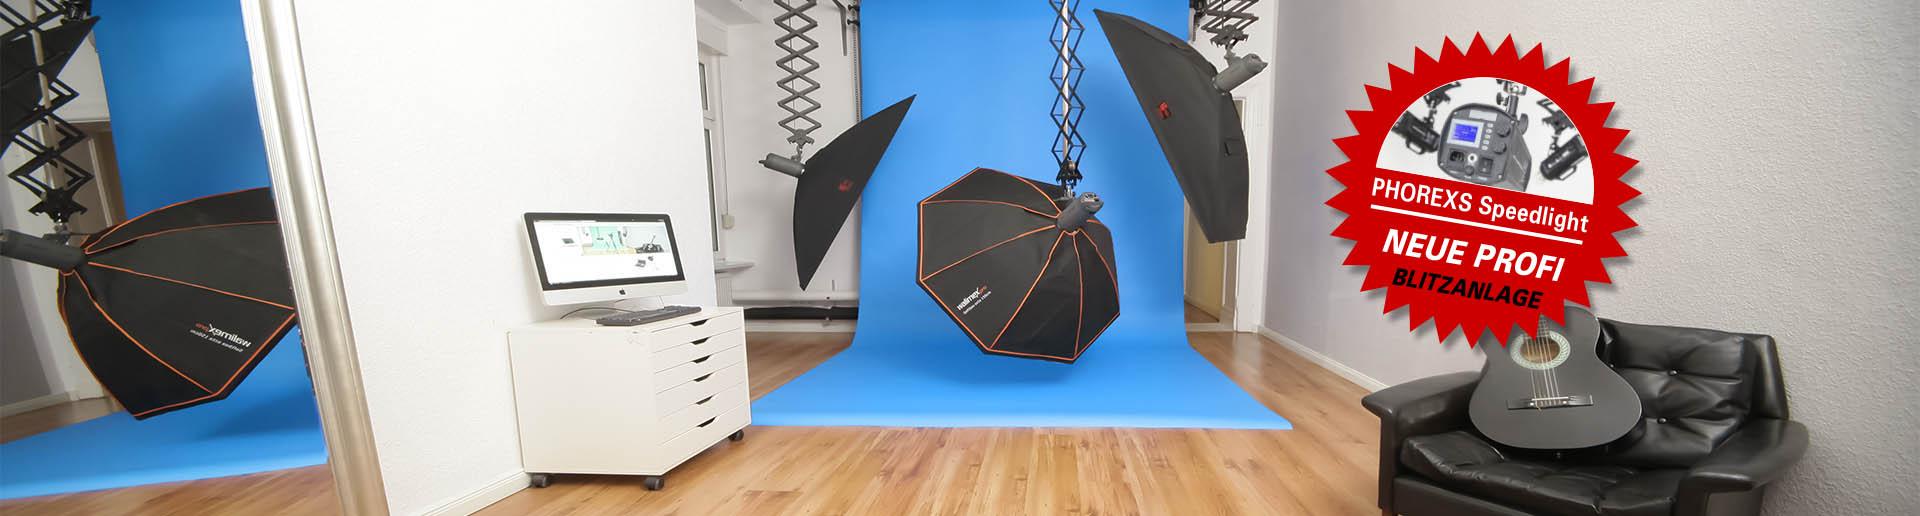 dein mietstudio berlin fotostudio mieten ab 8 60 h. Black Bedroom Furniture Sets. Home Design Ideas